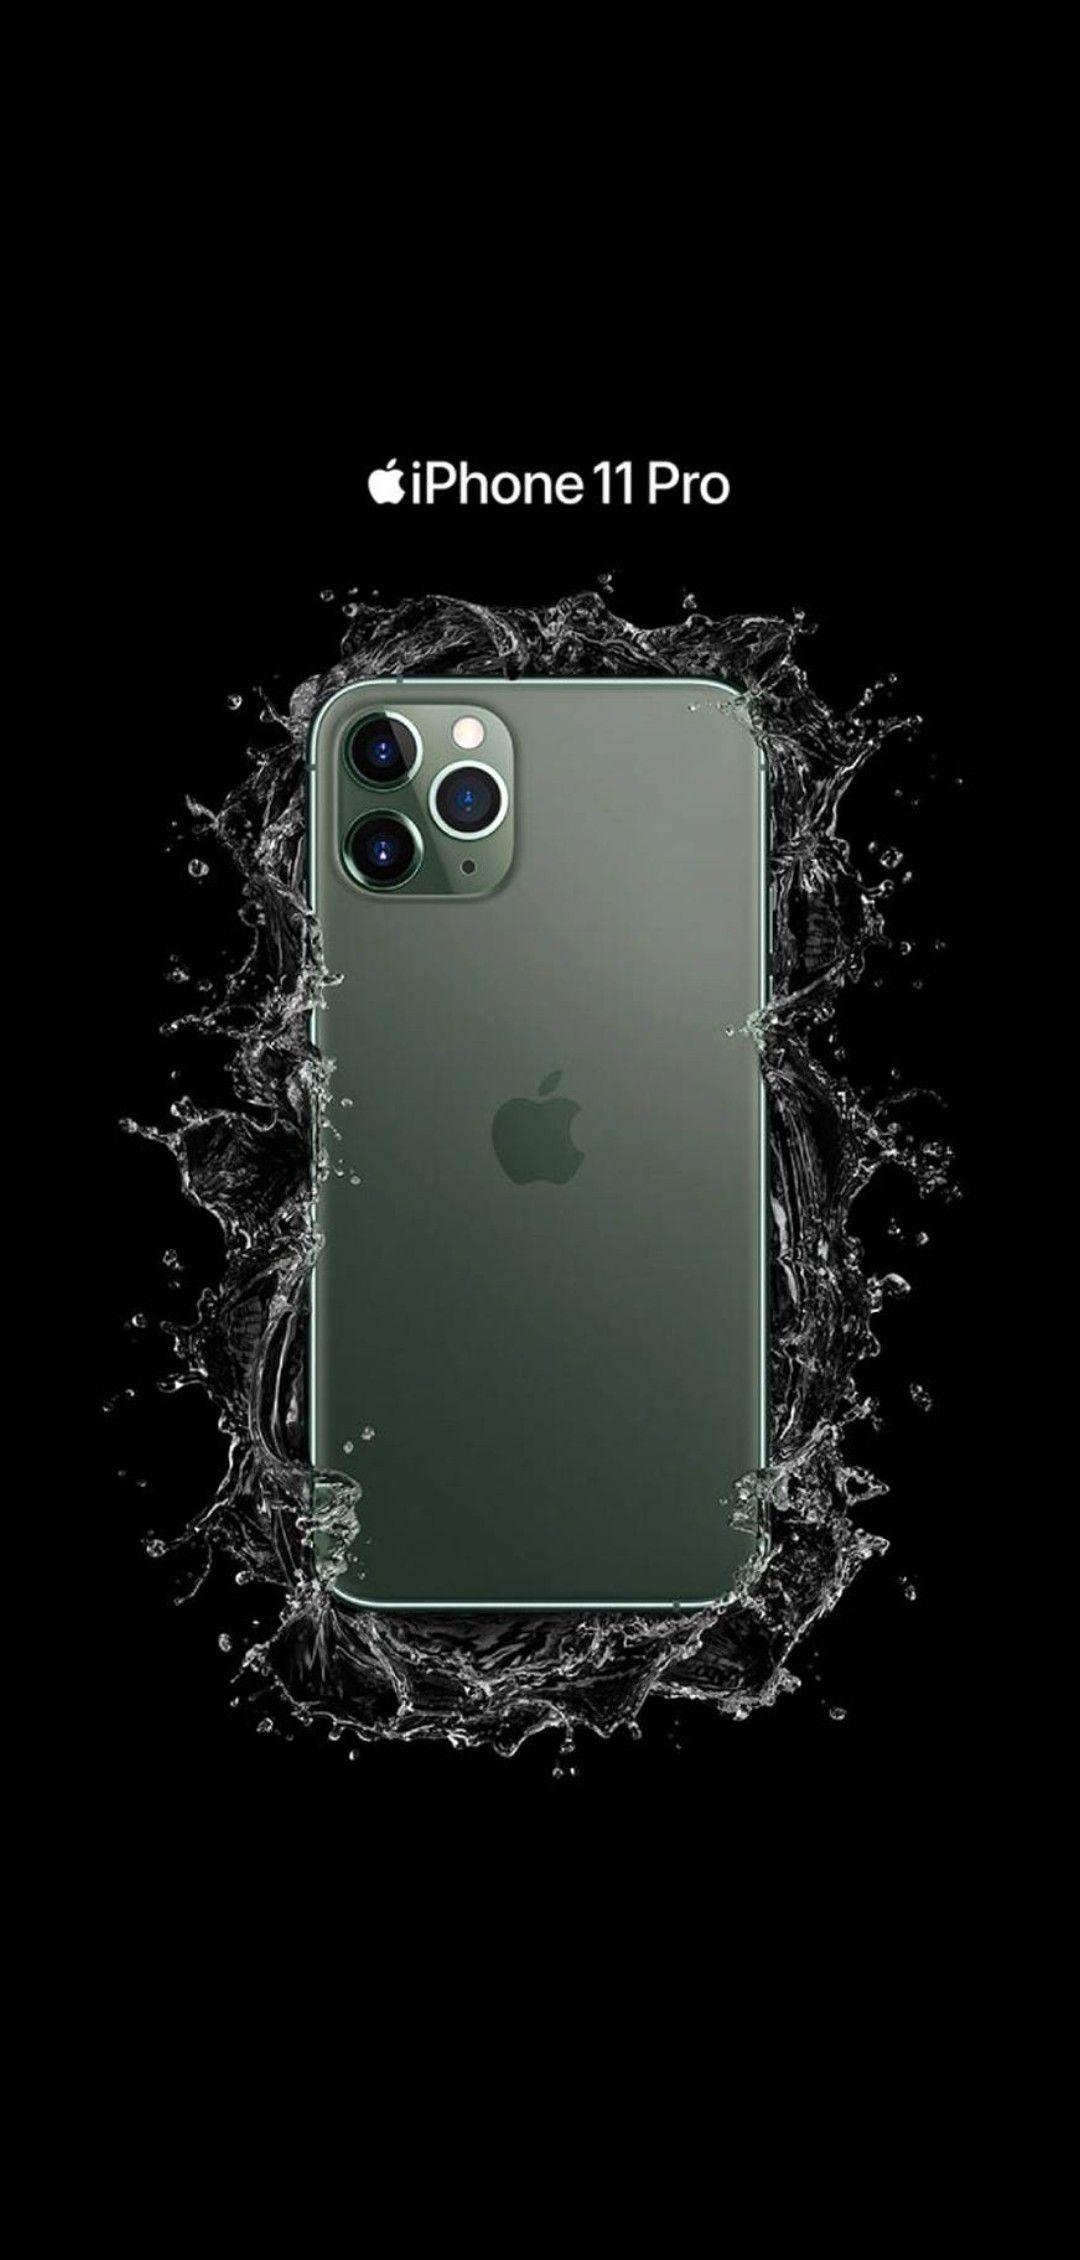 Iphone 11 Pro Iphone Iphone 11 Dark Phone Wallpapers